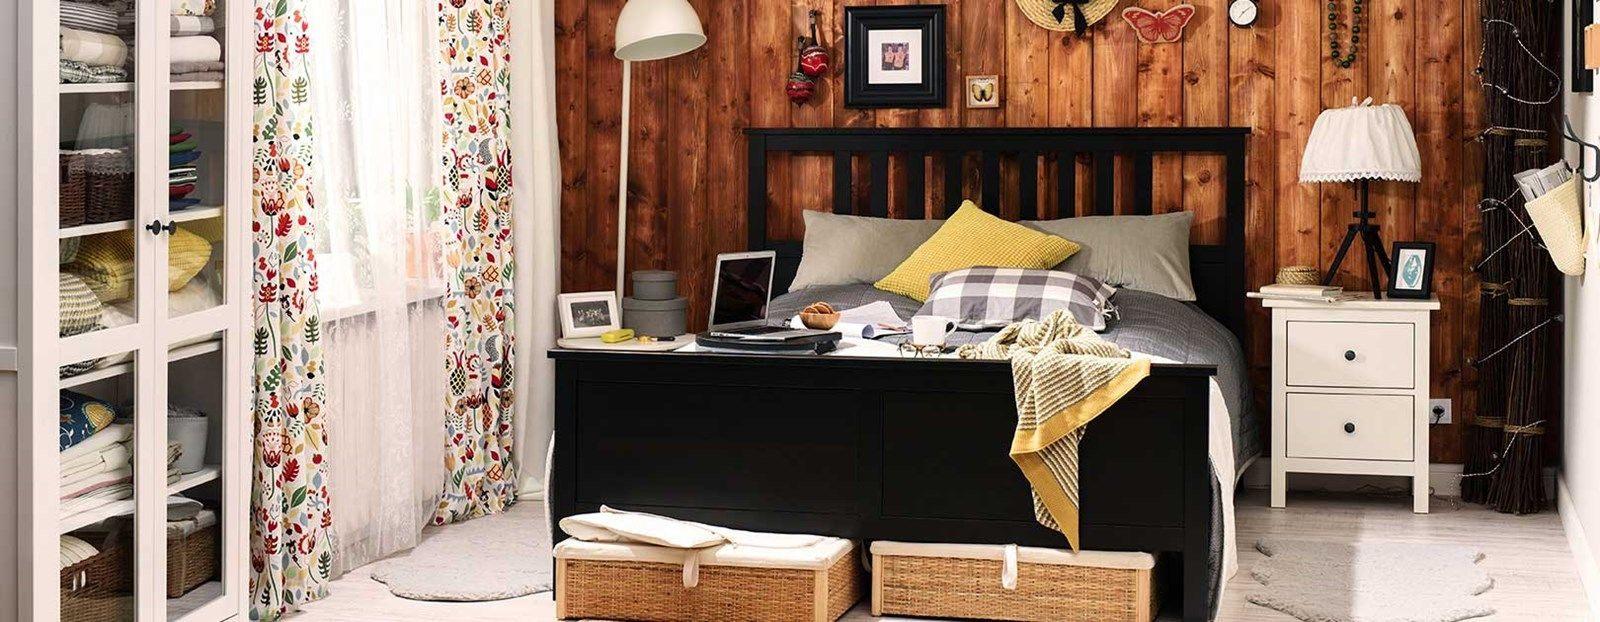 Cuisine Ikea Ringhult Impressionnant Image Meuble Metod Ikea Génial Dimensions Meubles Cuisine Cuisine Ikea